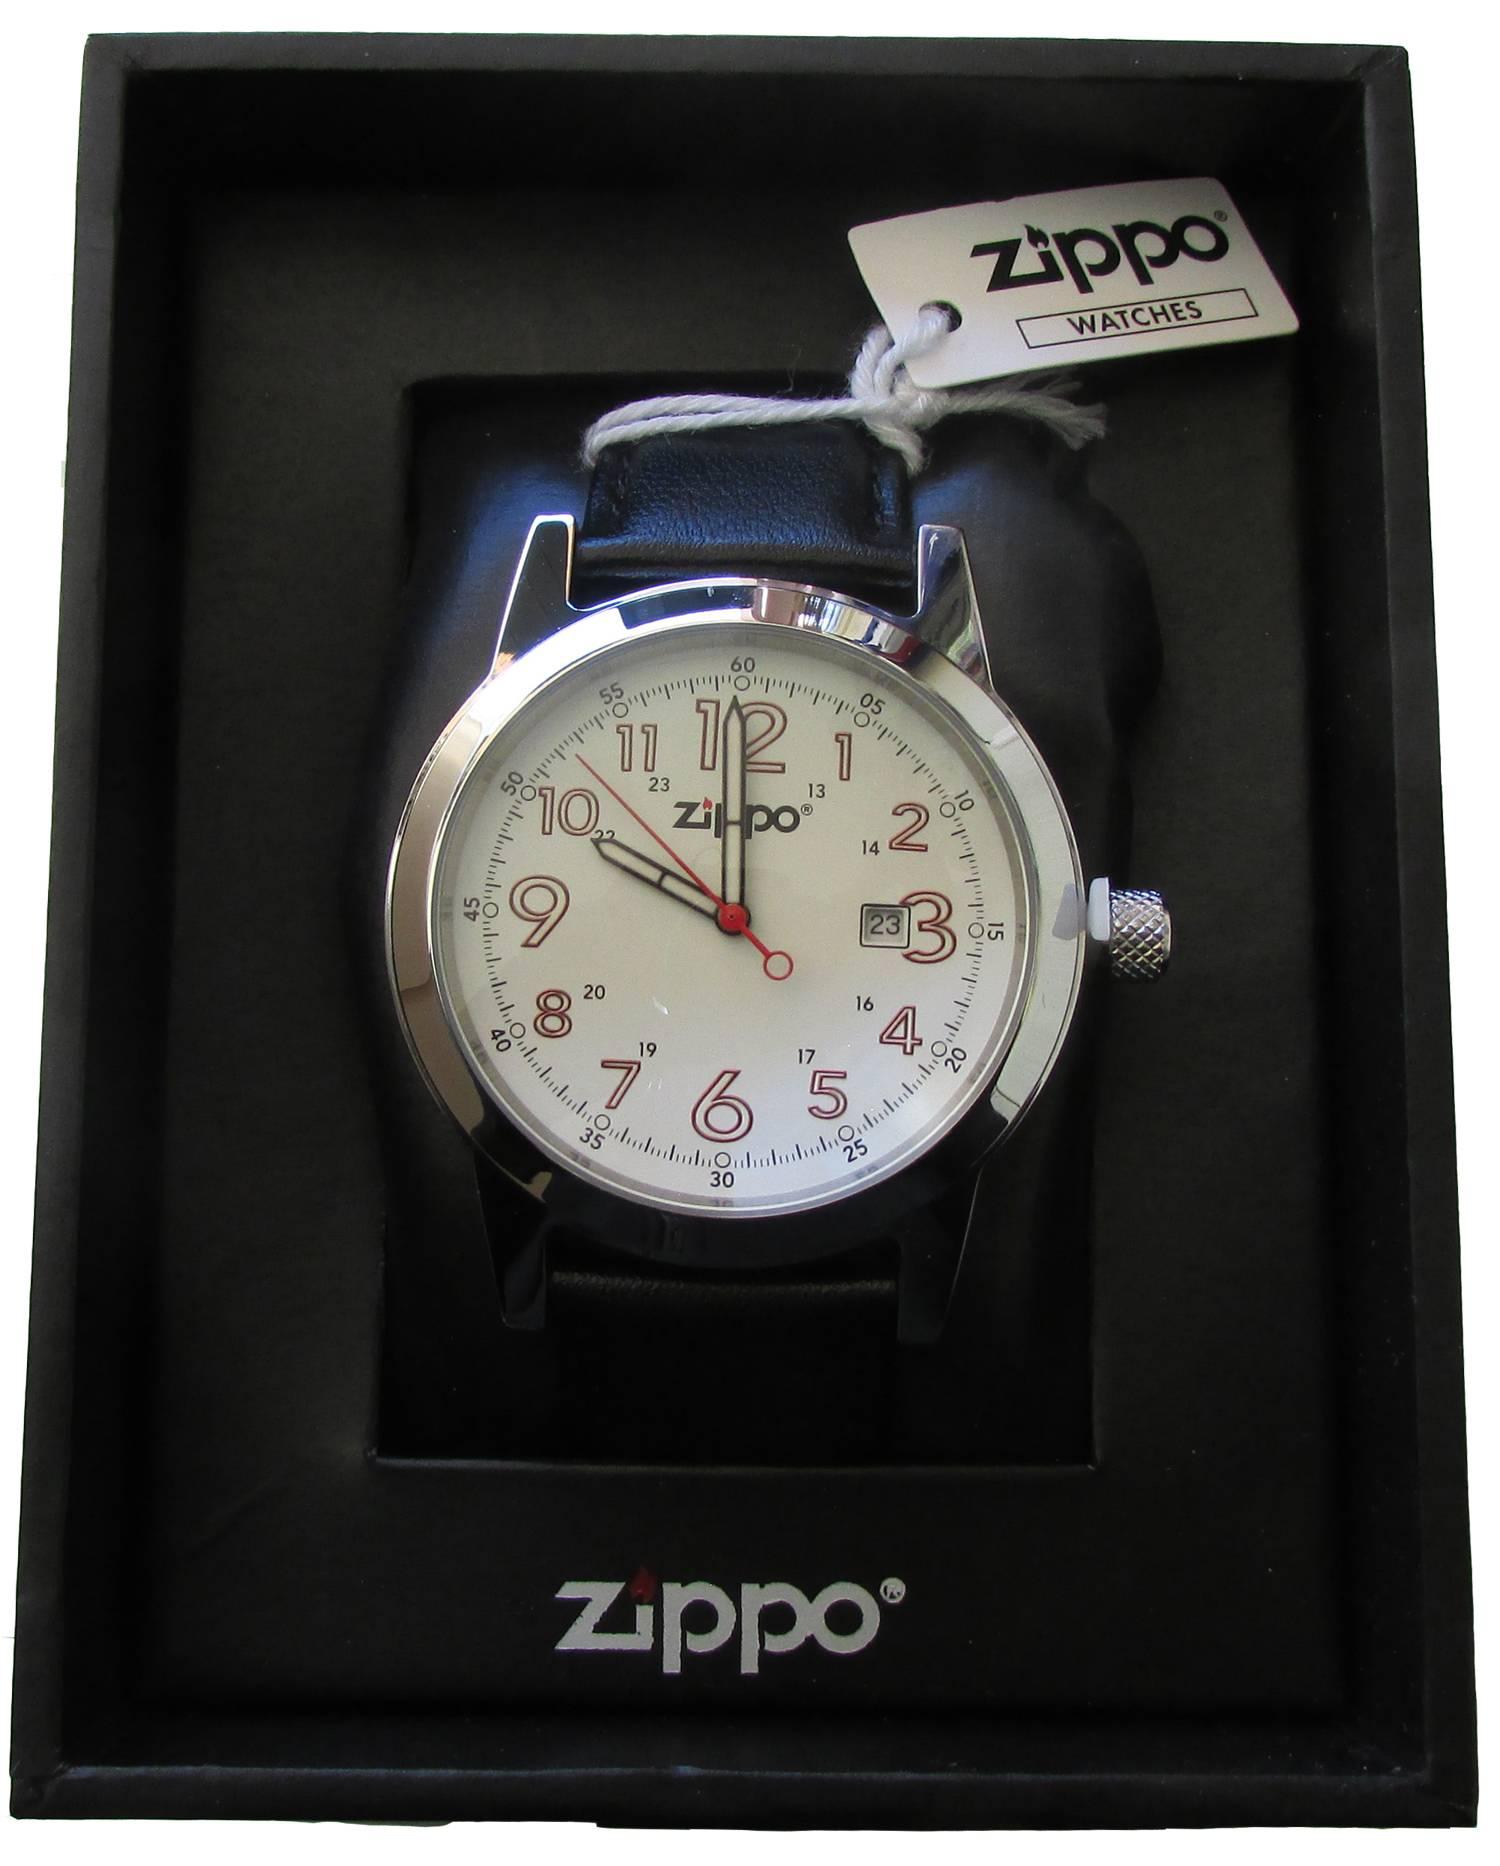 Zippo Watch